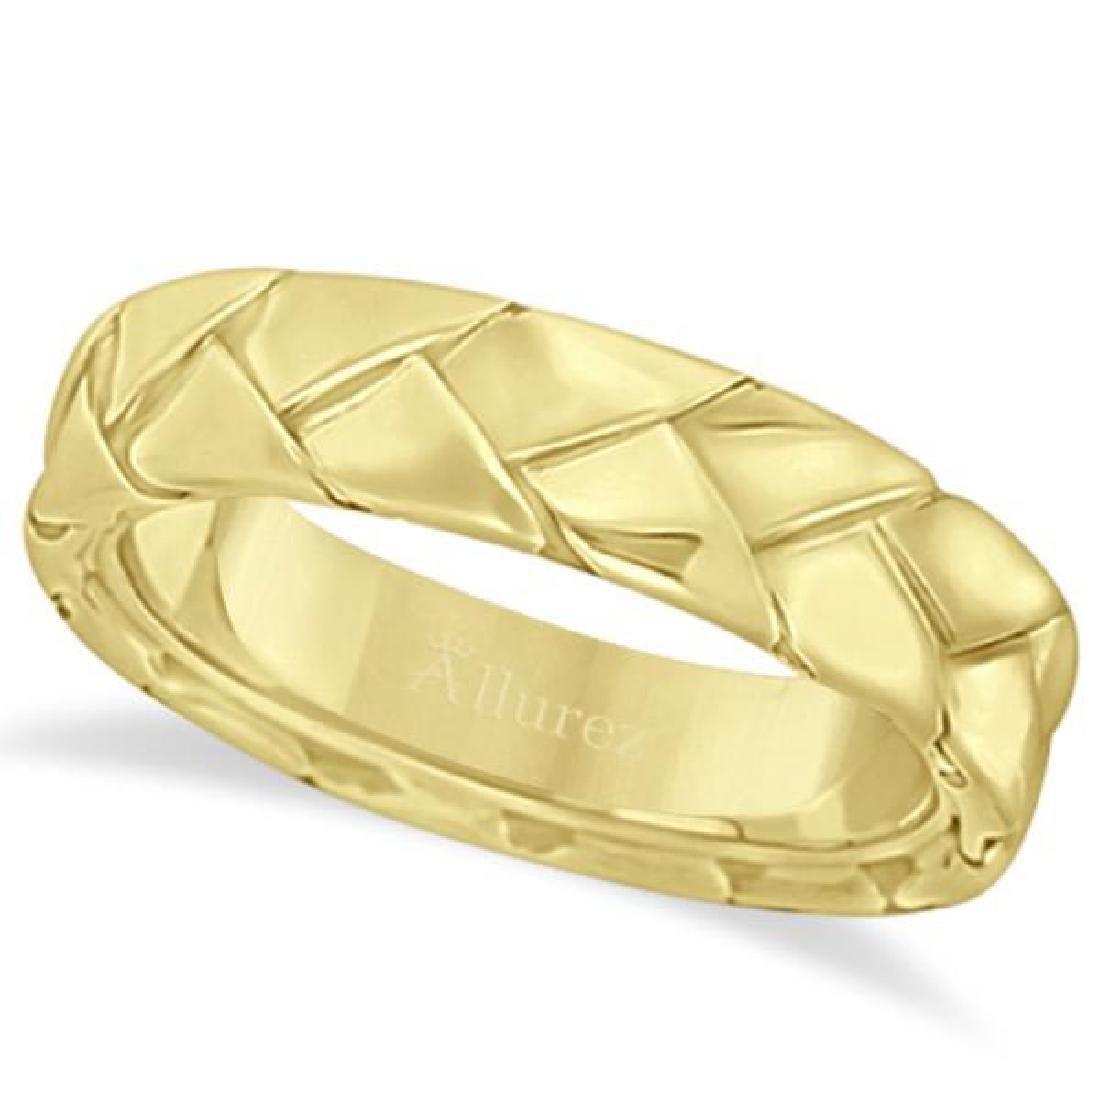 Mens High Polish Braided Handwoven Wedding Ring 14k Ye